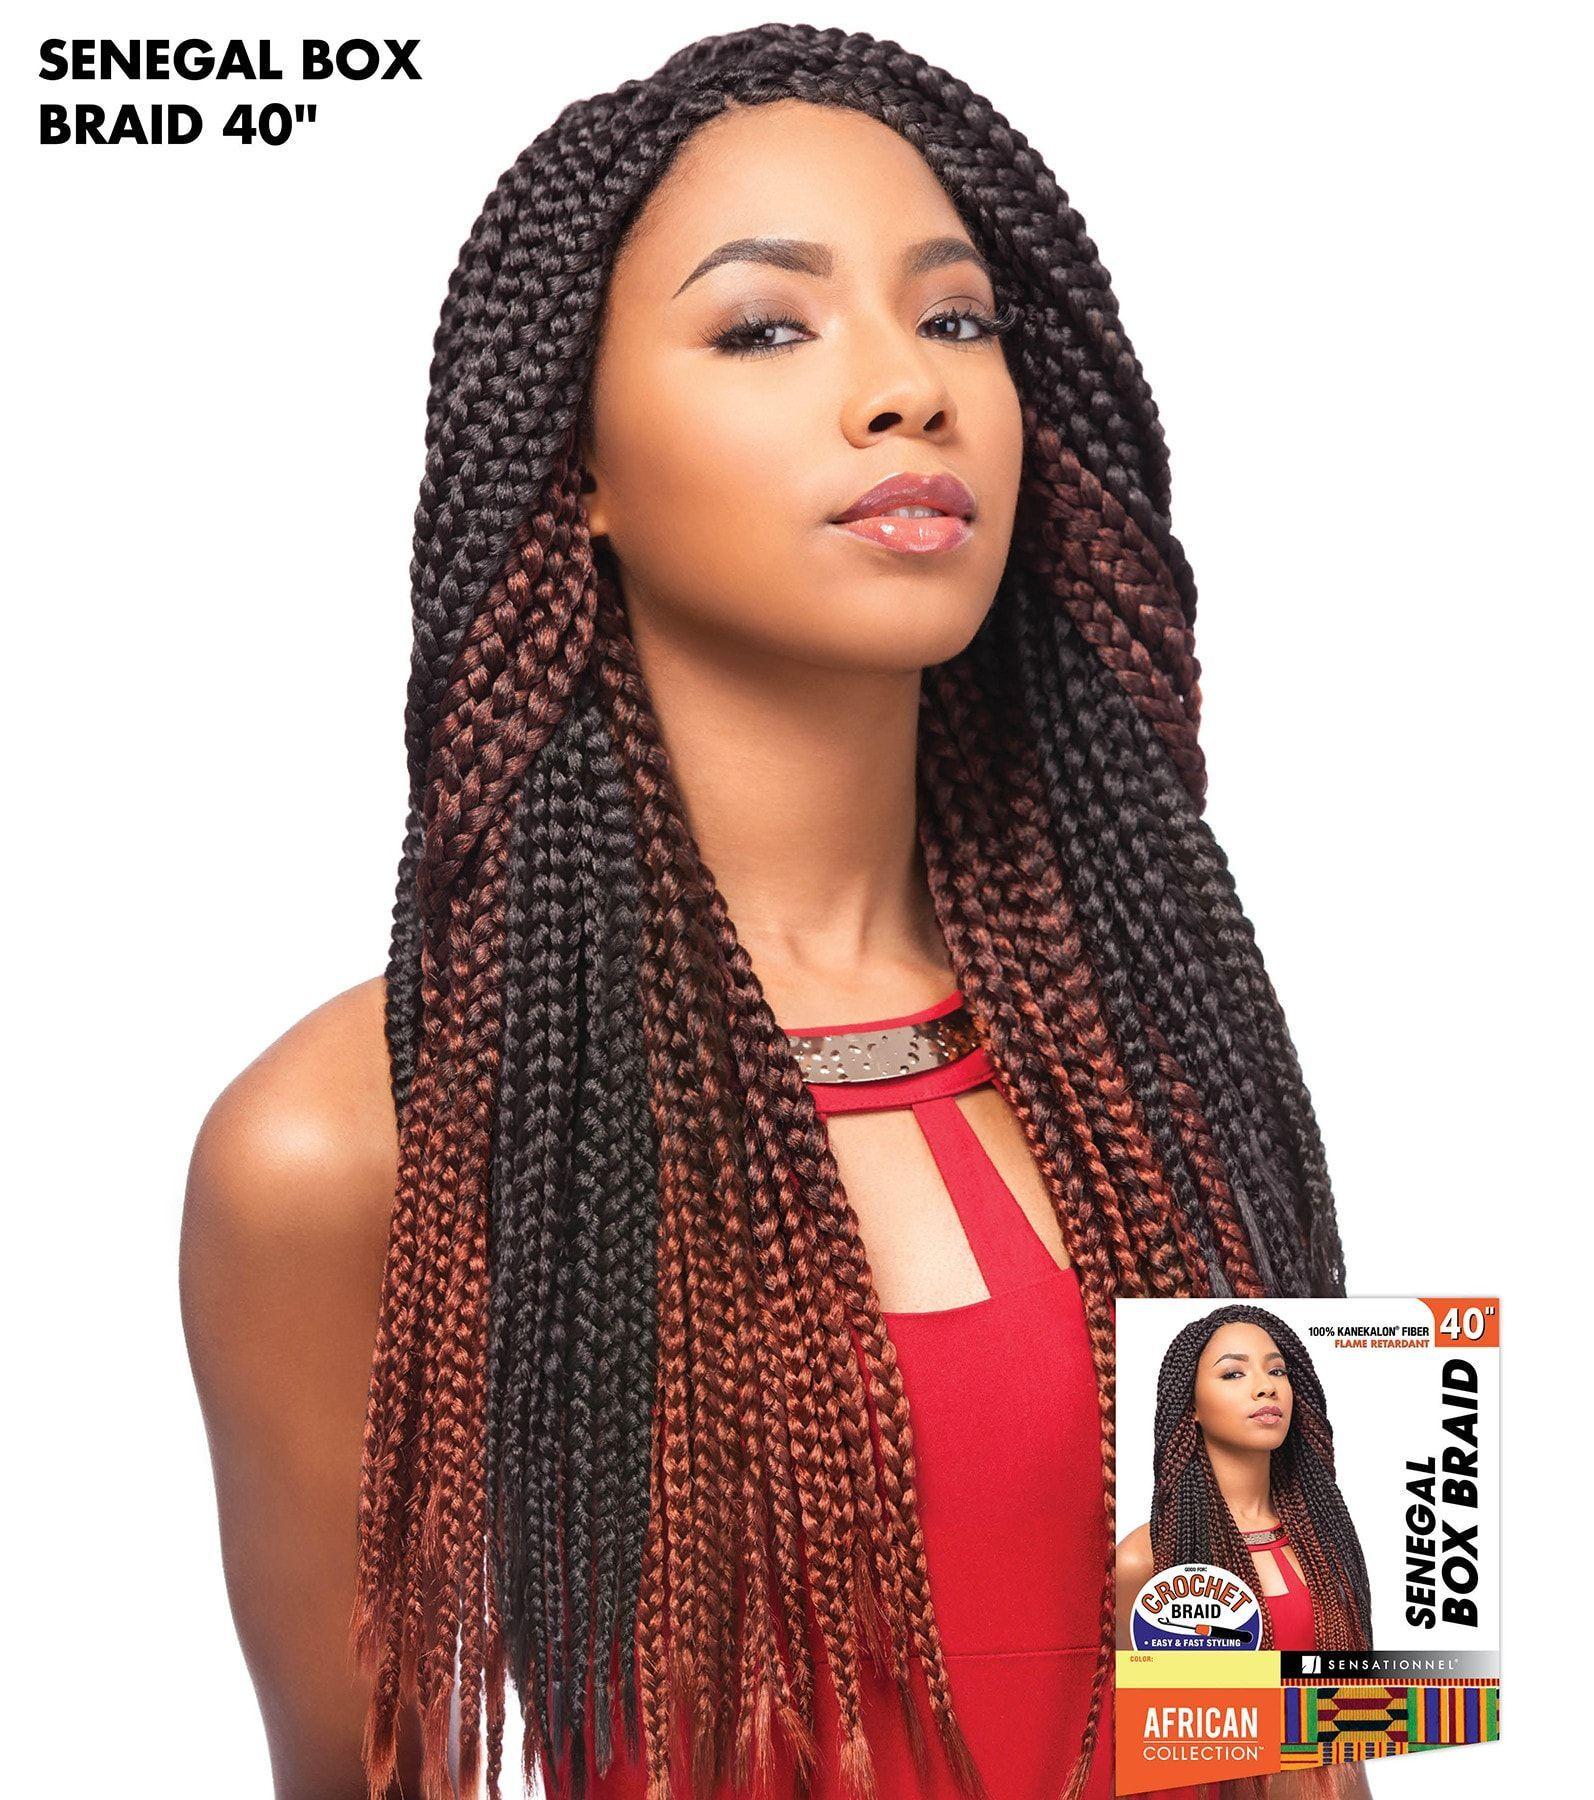 sensationnel african collection crochet braid - senegal box braid